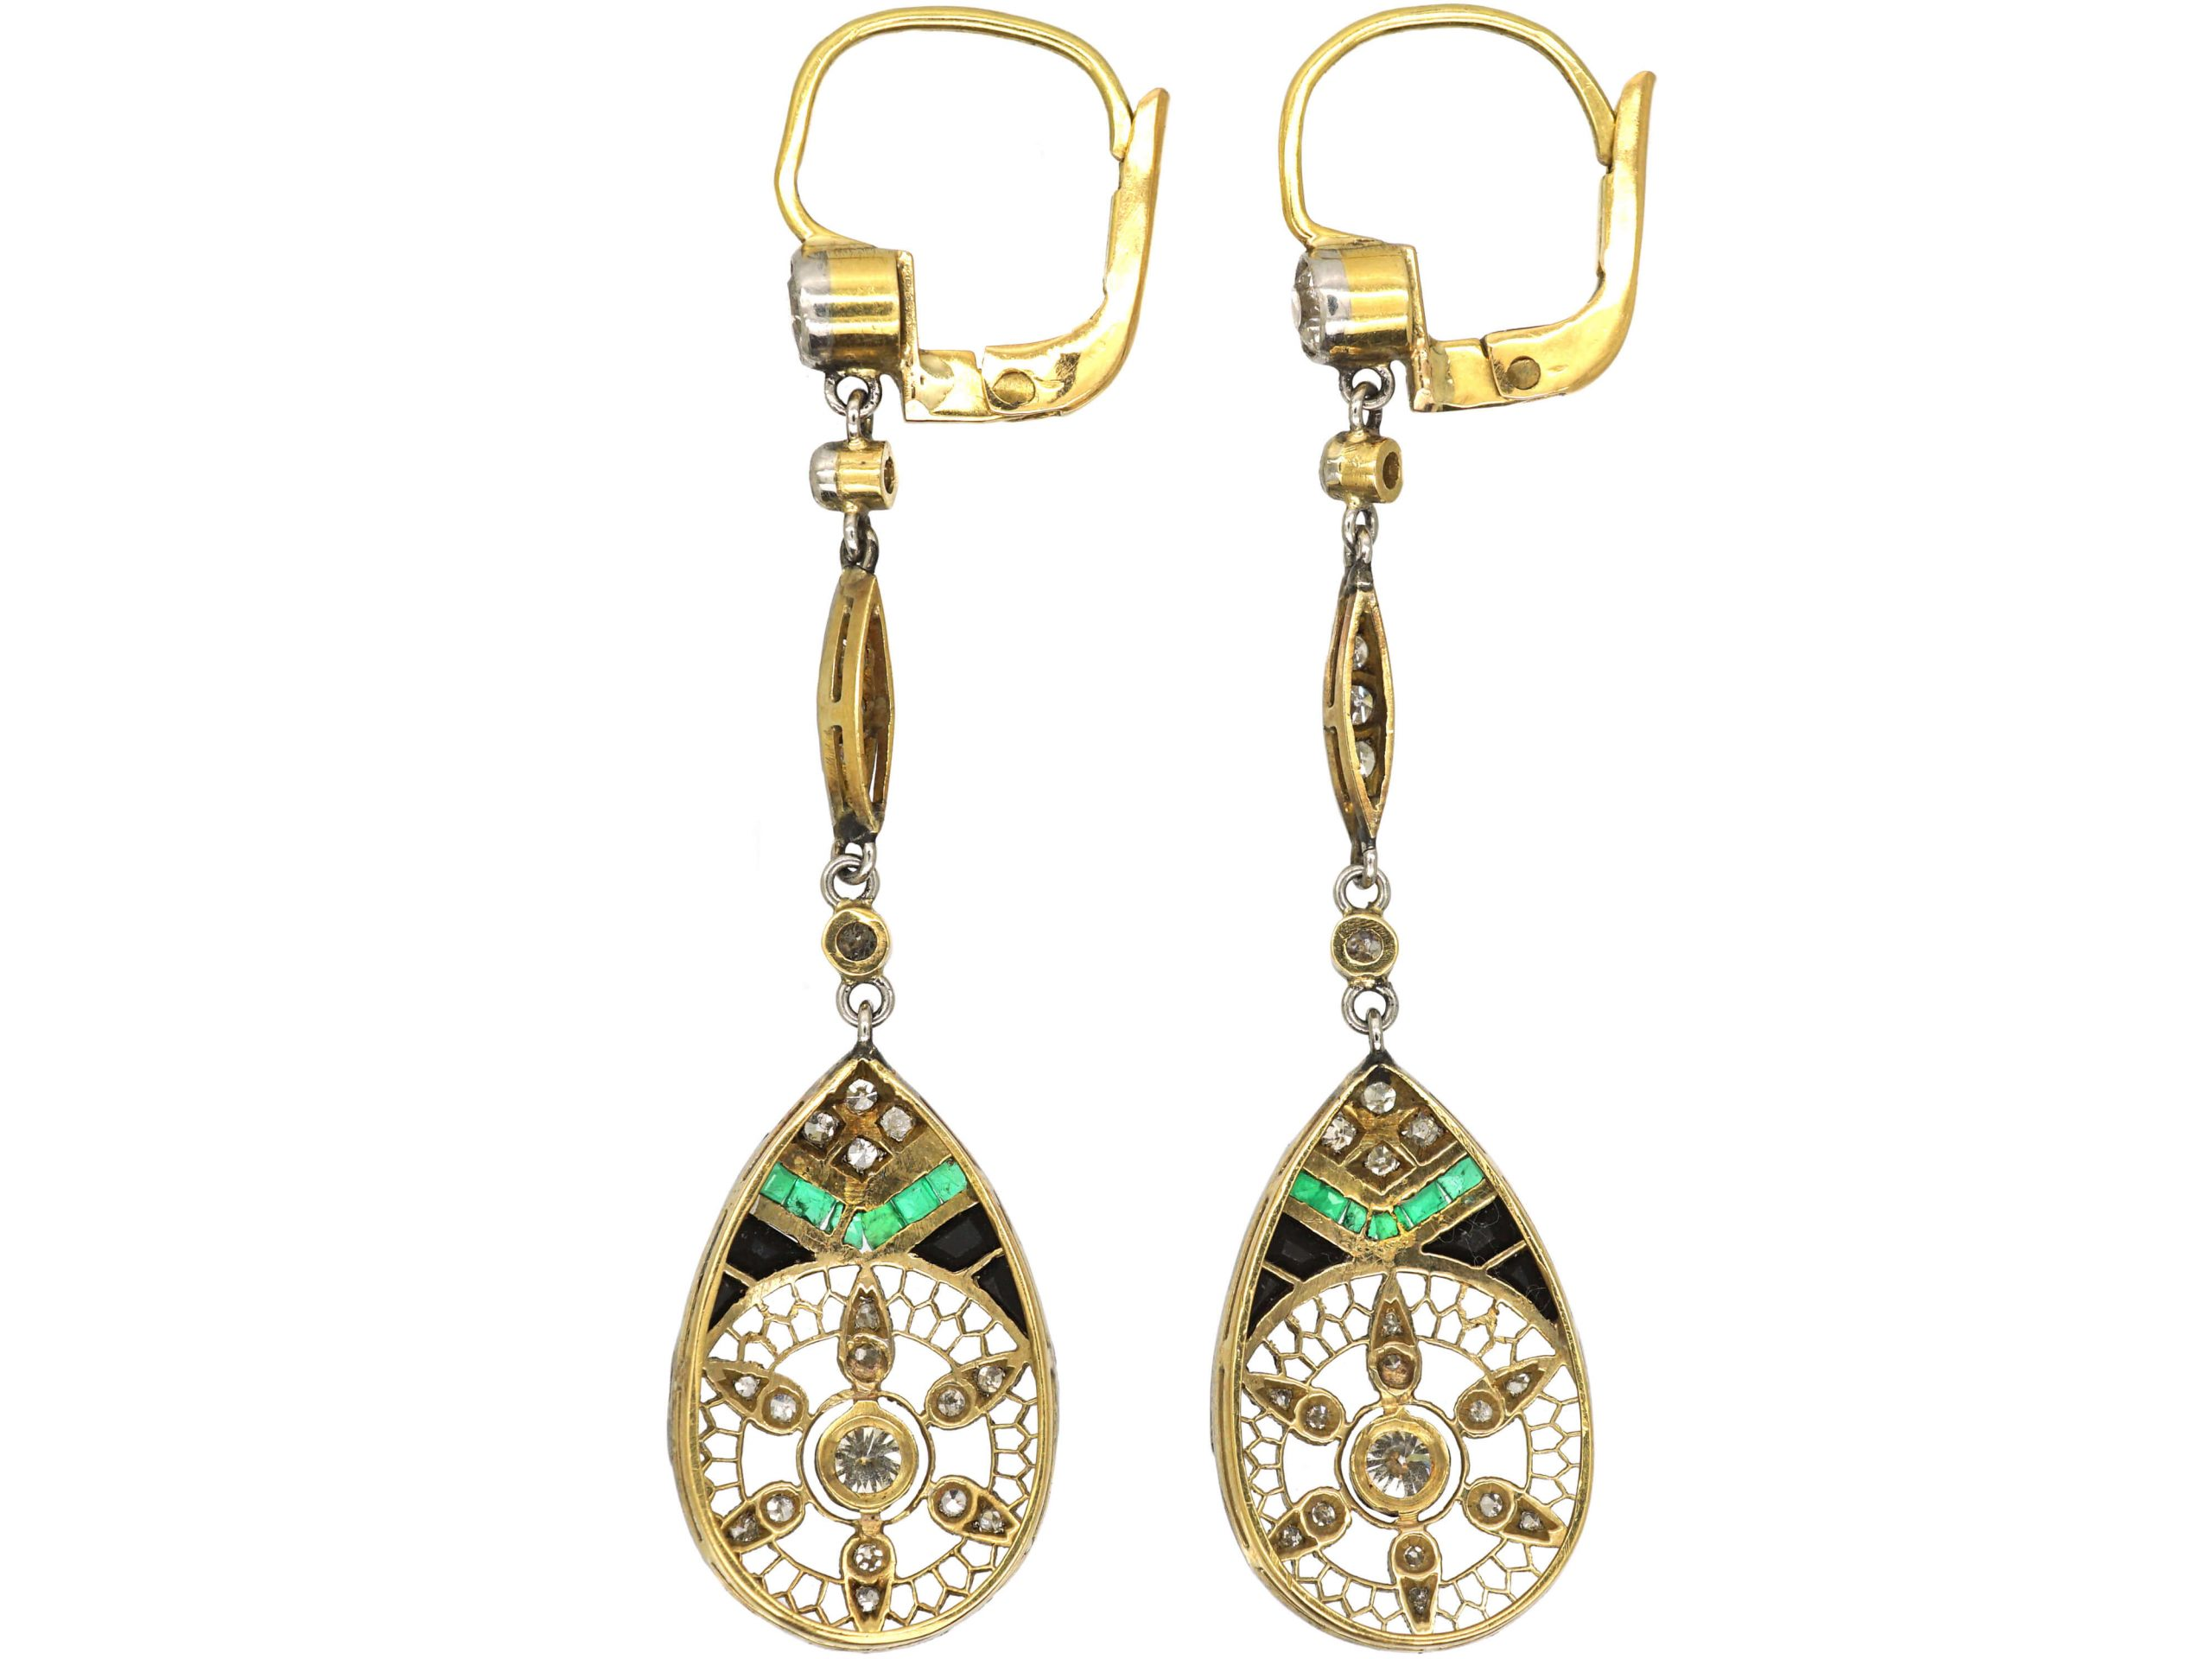 Art Deco 18ct Gold & Platinum, Emerald, Sapphire & Diamond Drop Earrings